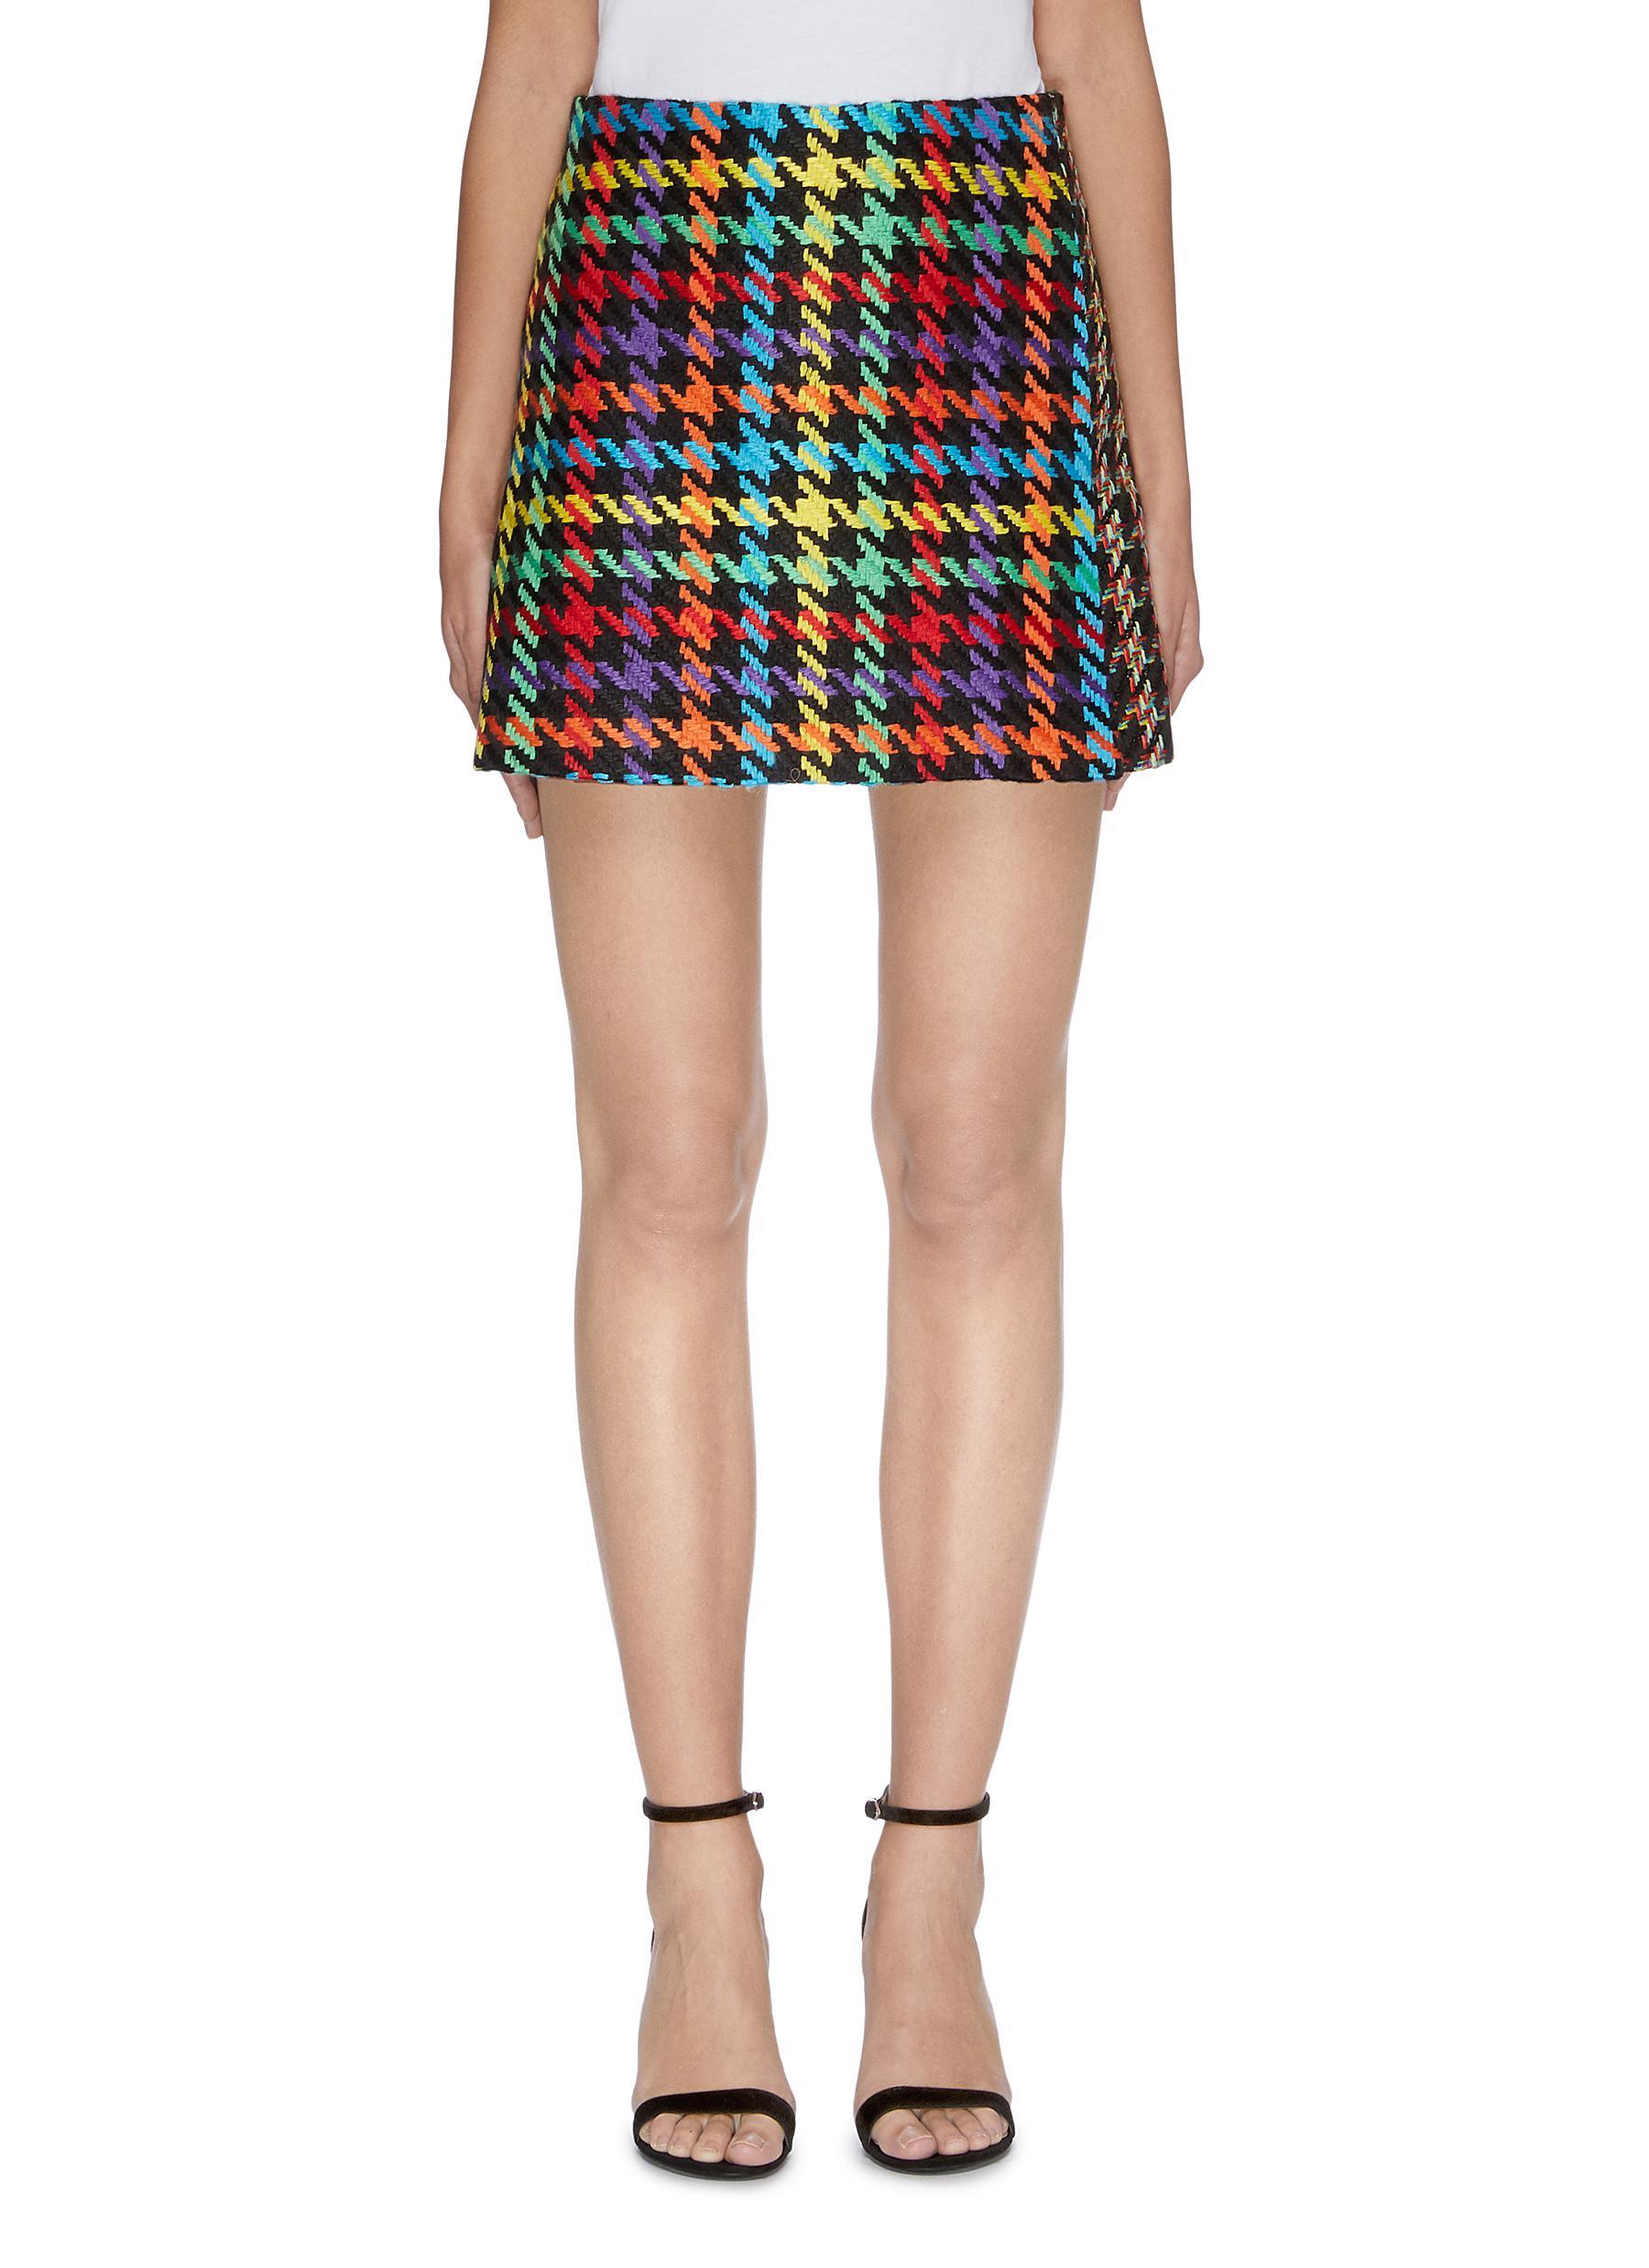 Darma colourblock houndstooth skirt by Alice + Olivia